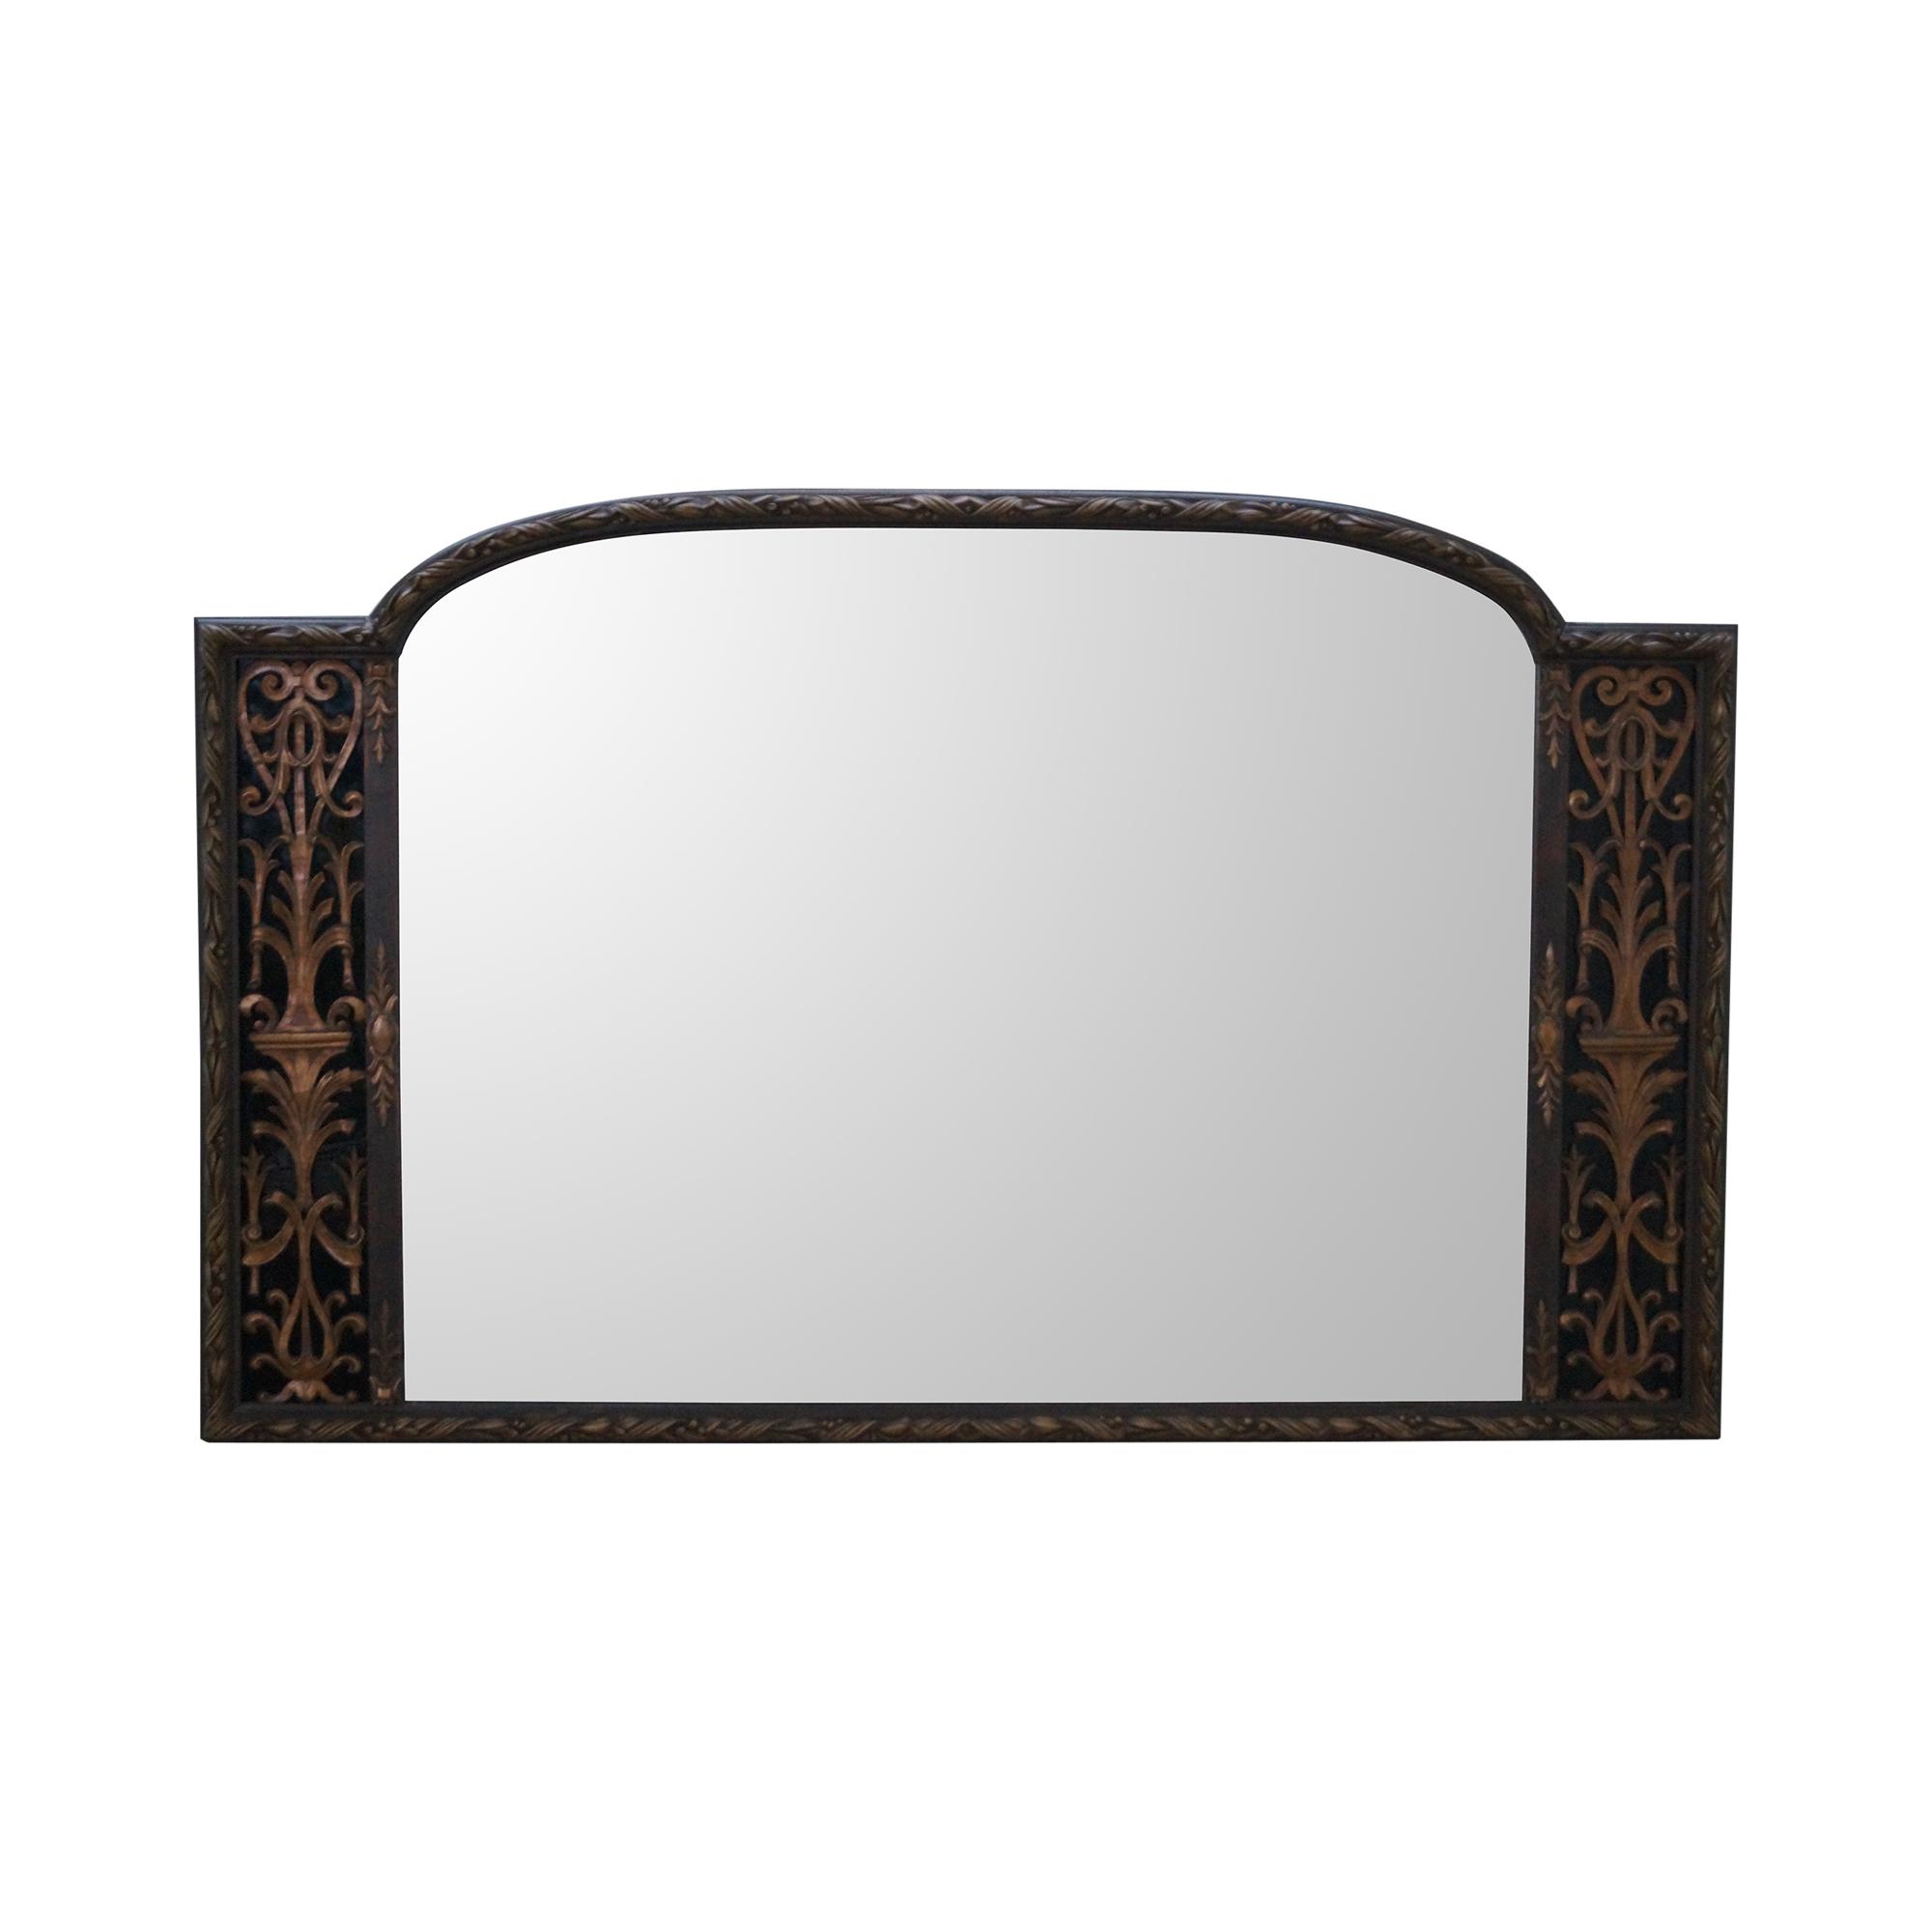 Antique Art Deco Gold Frame Mirror amp Black Glass Chairish